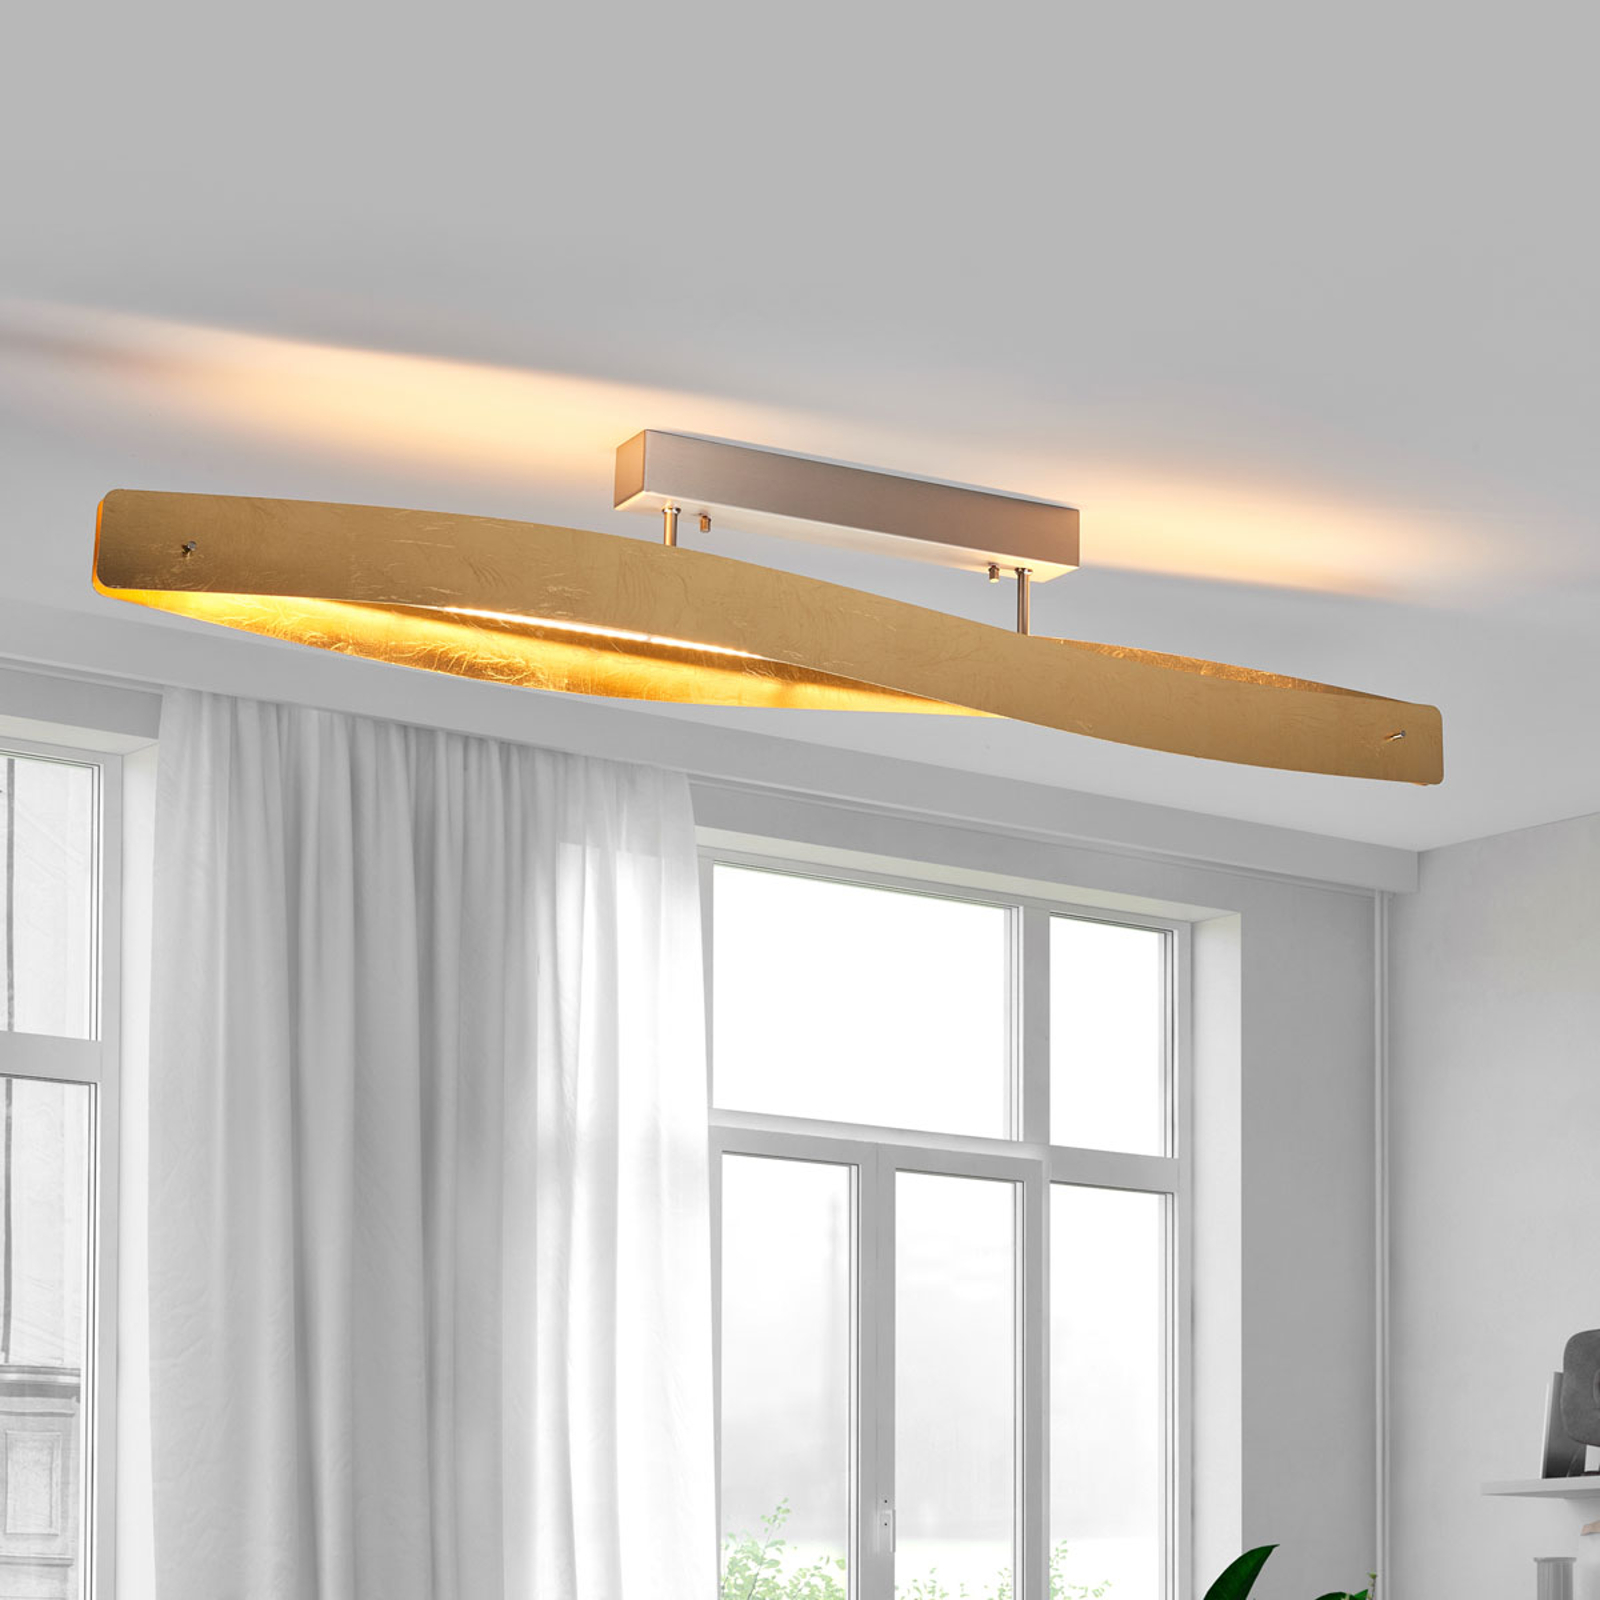 Elegante led plafondlamp met slagmetalen afwerking